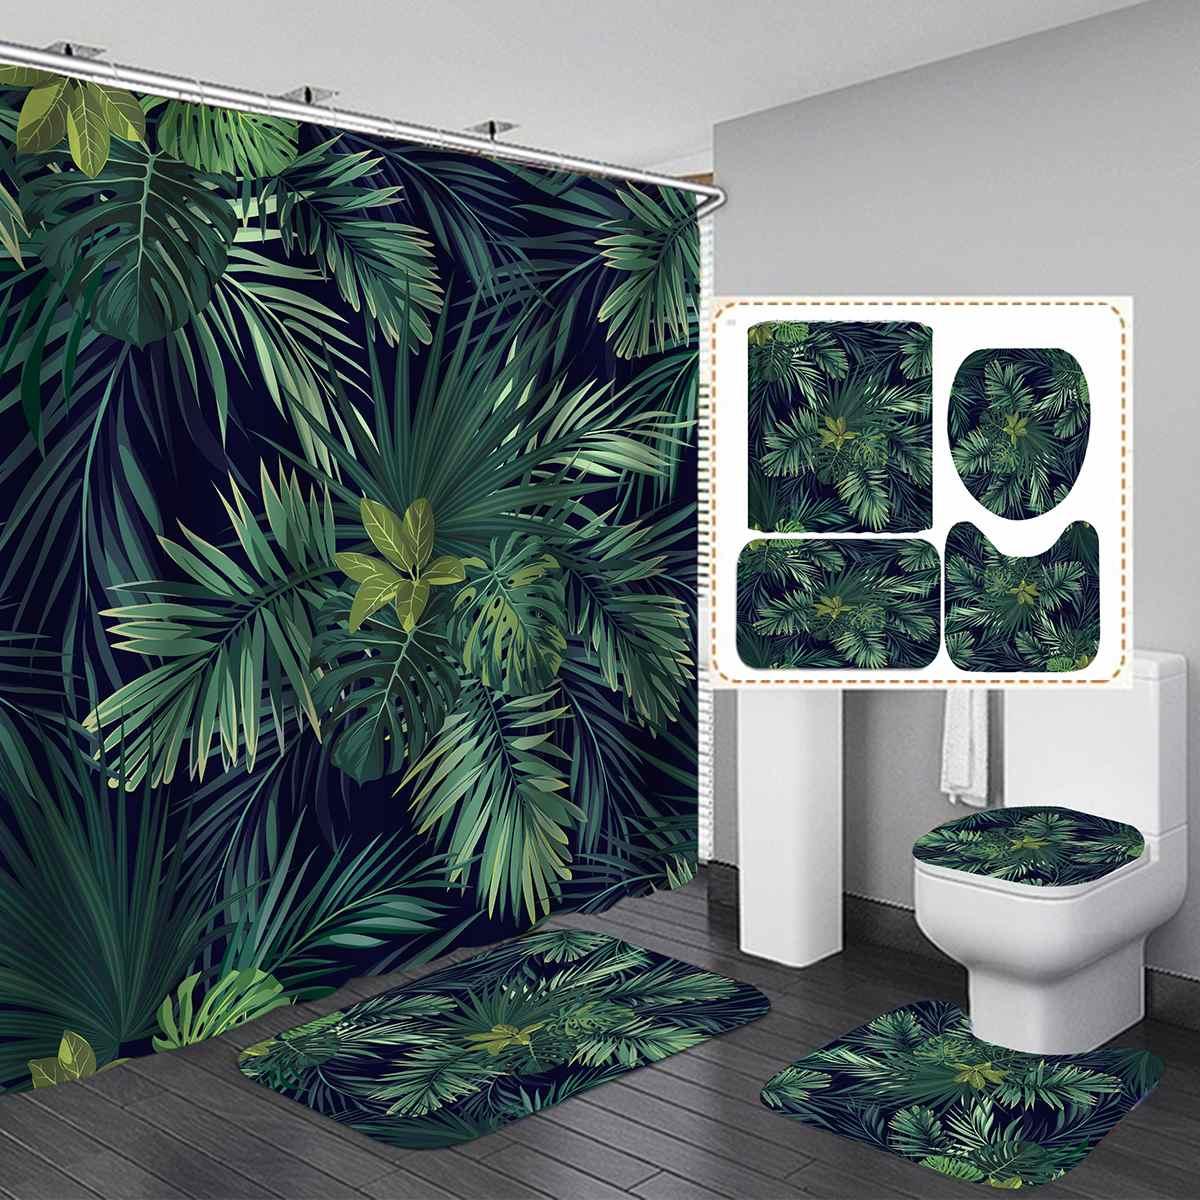 Green Tropical Plant Leaves Printed Curtain For Bathroom Shower Anti-slip Bath Mat Sets Toilet Cover Kitchen Carpet